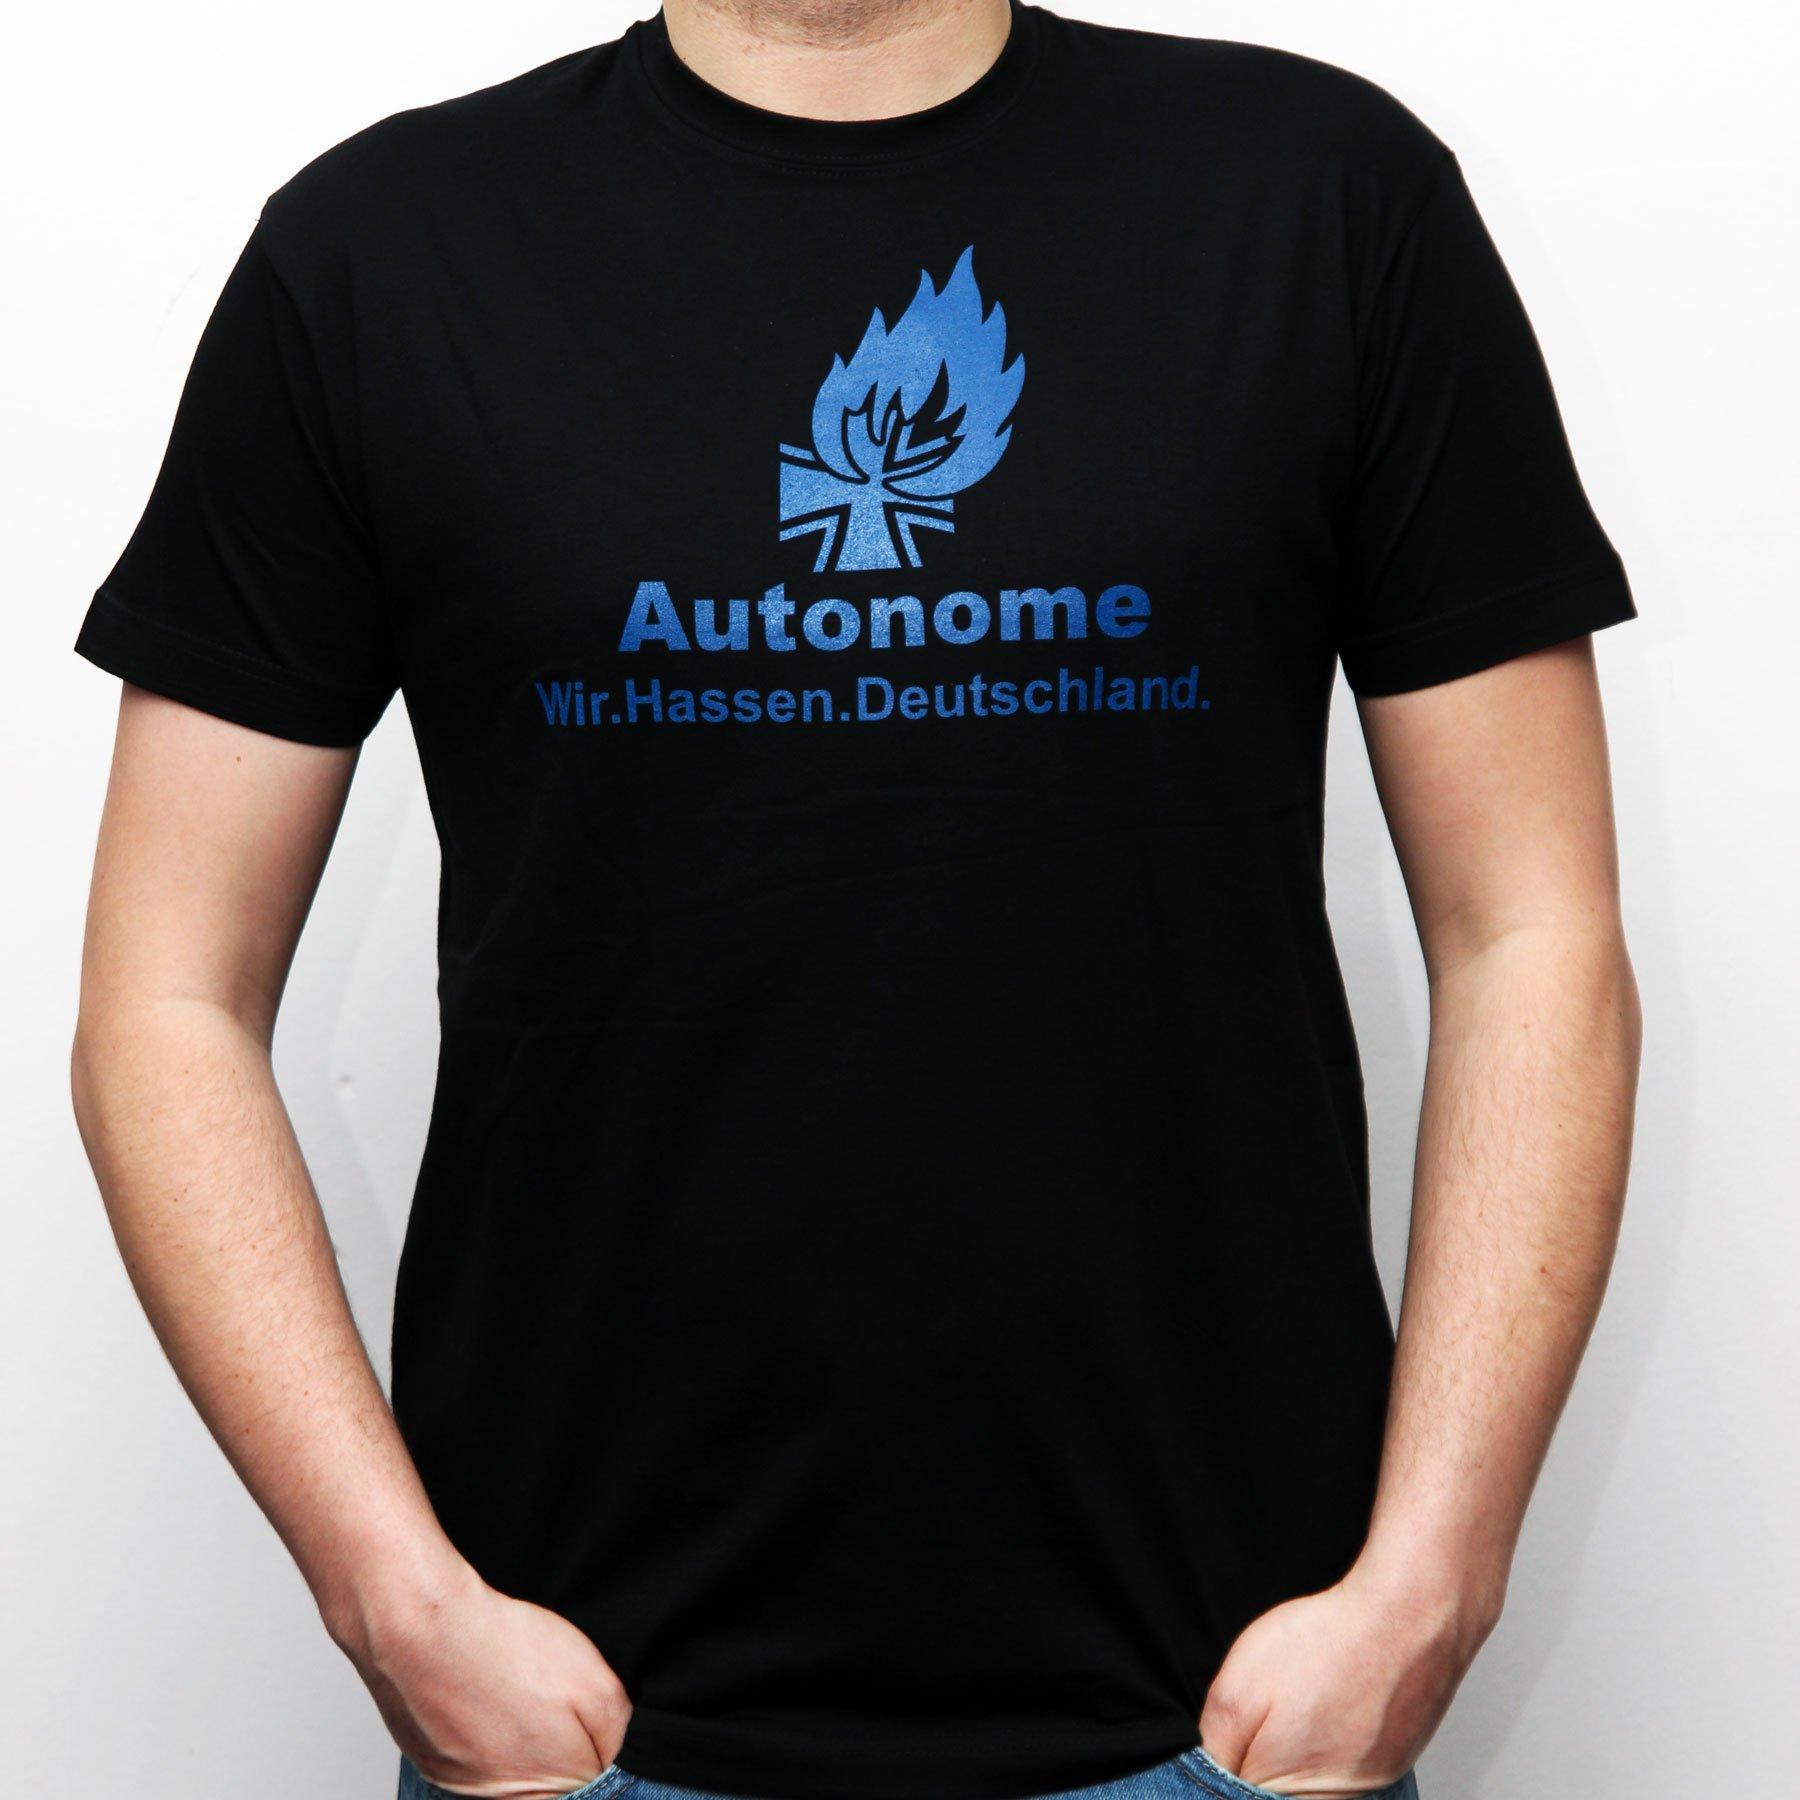 """Autonome"" Shirt"